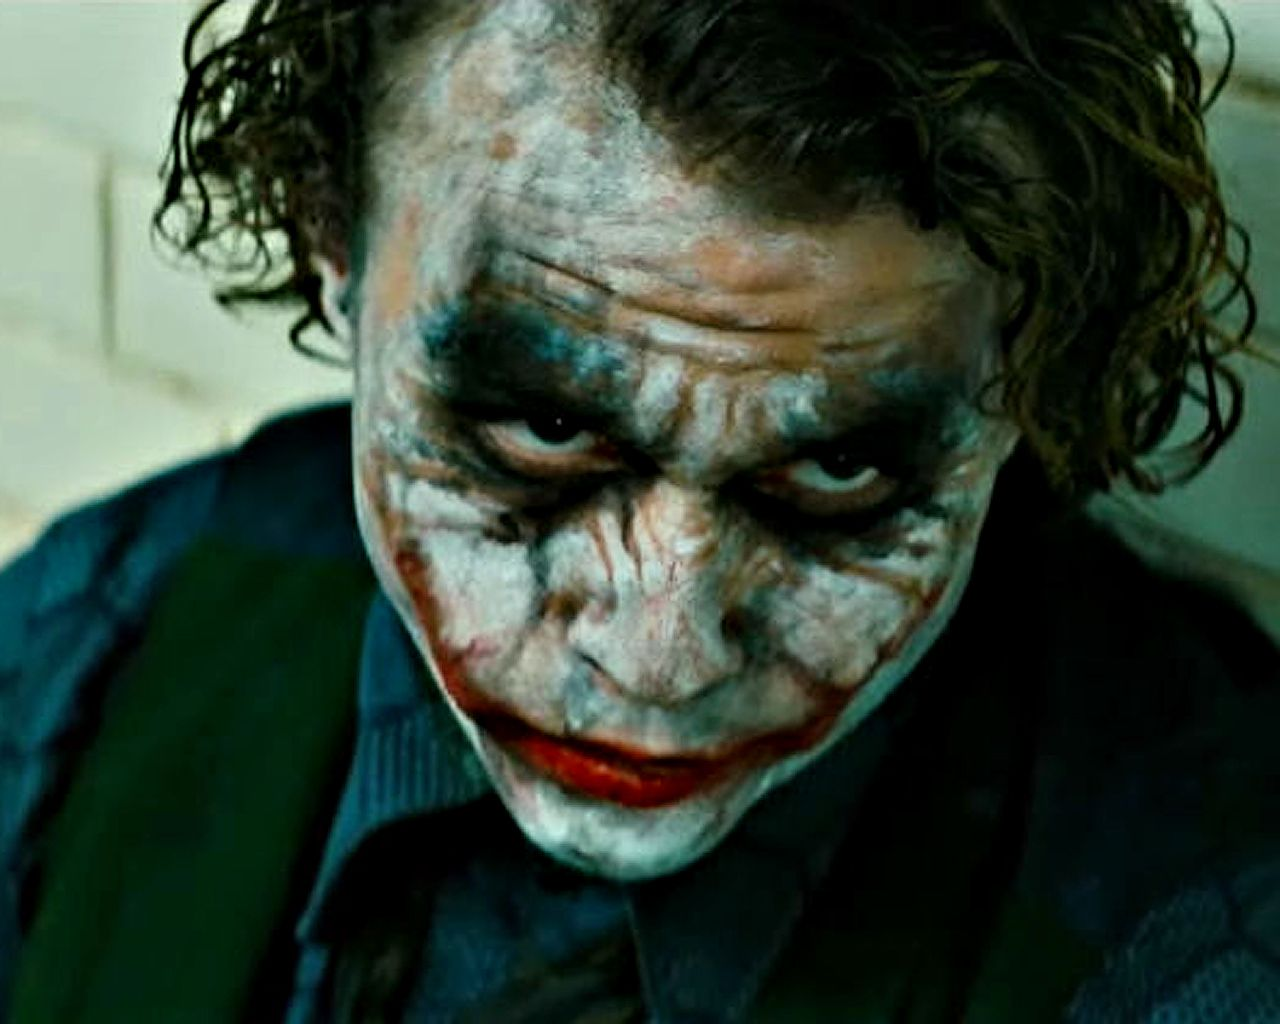 Image Heath Ledger As Joker Wallpaper 1280 1024 Batman Wallpapers 1280x1024